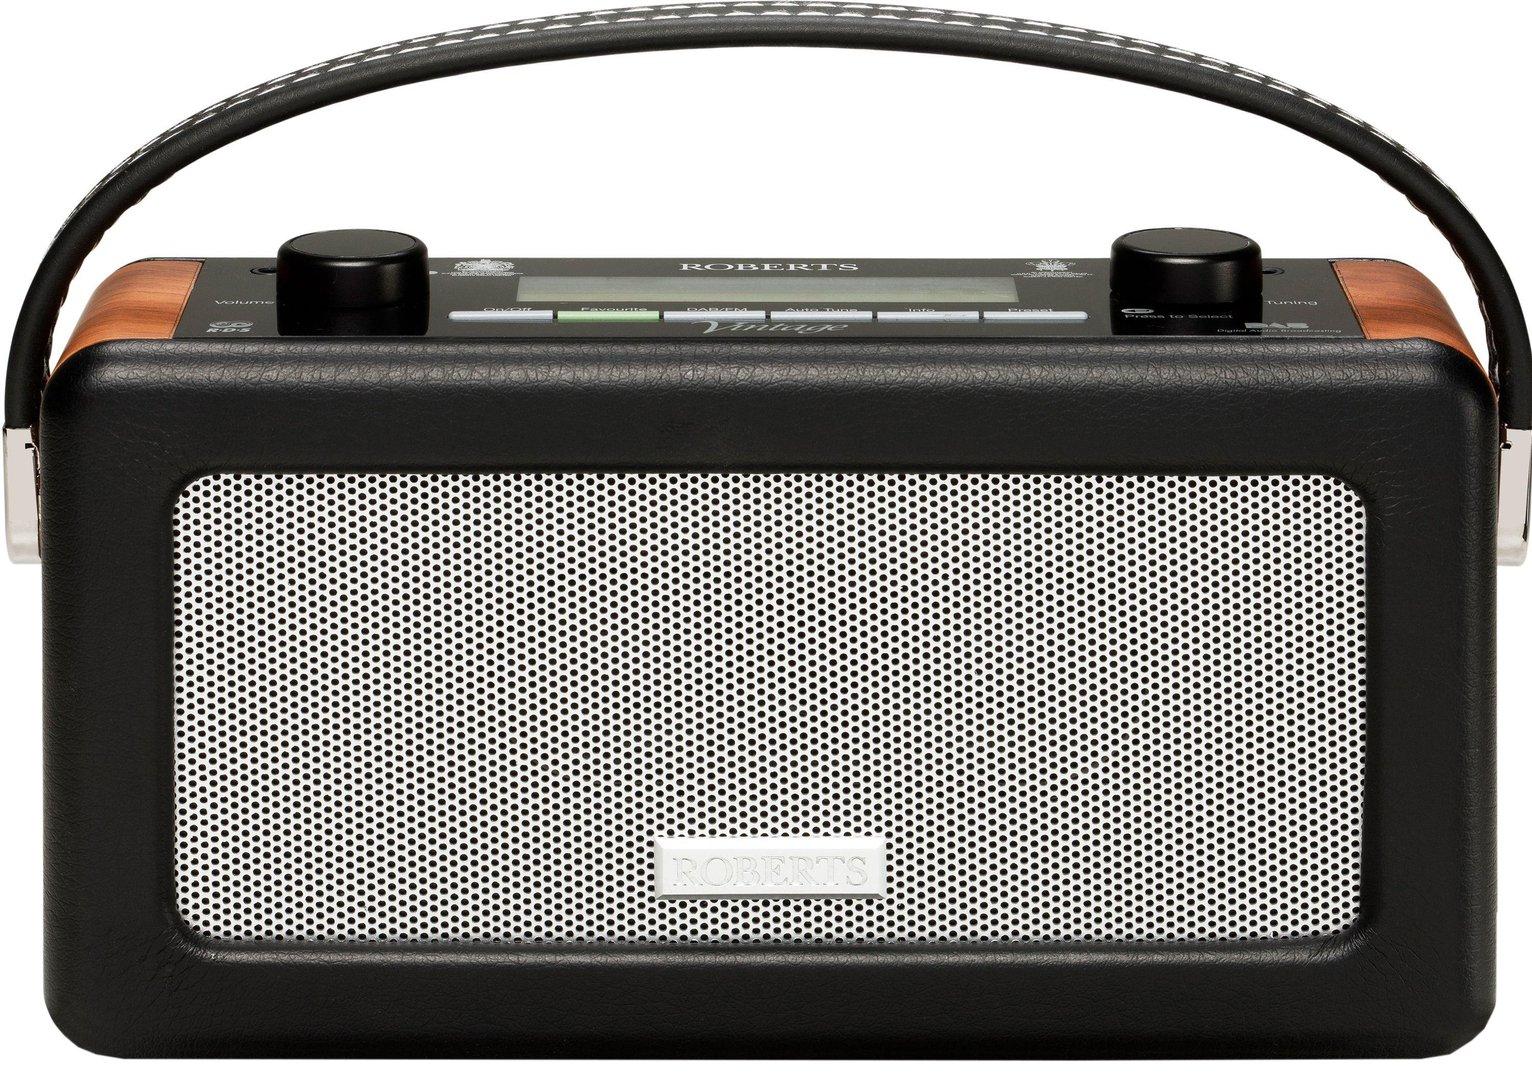 ROBERTS Vintage Portable DAB Radio - Black, Black